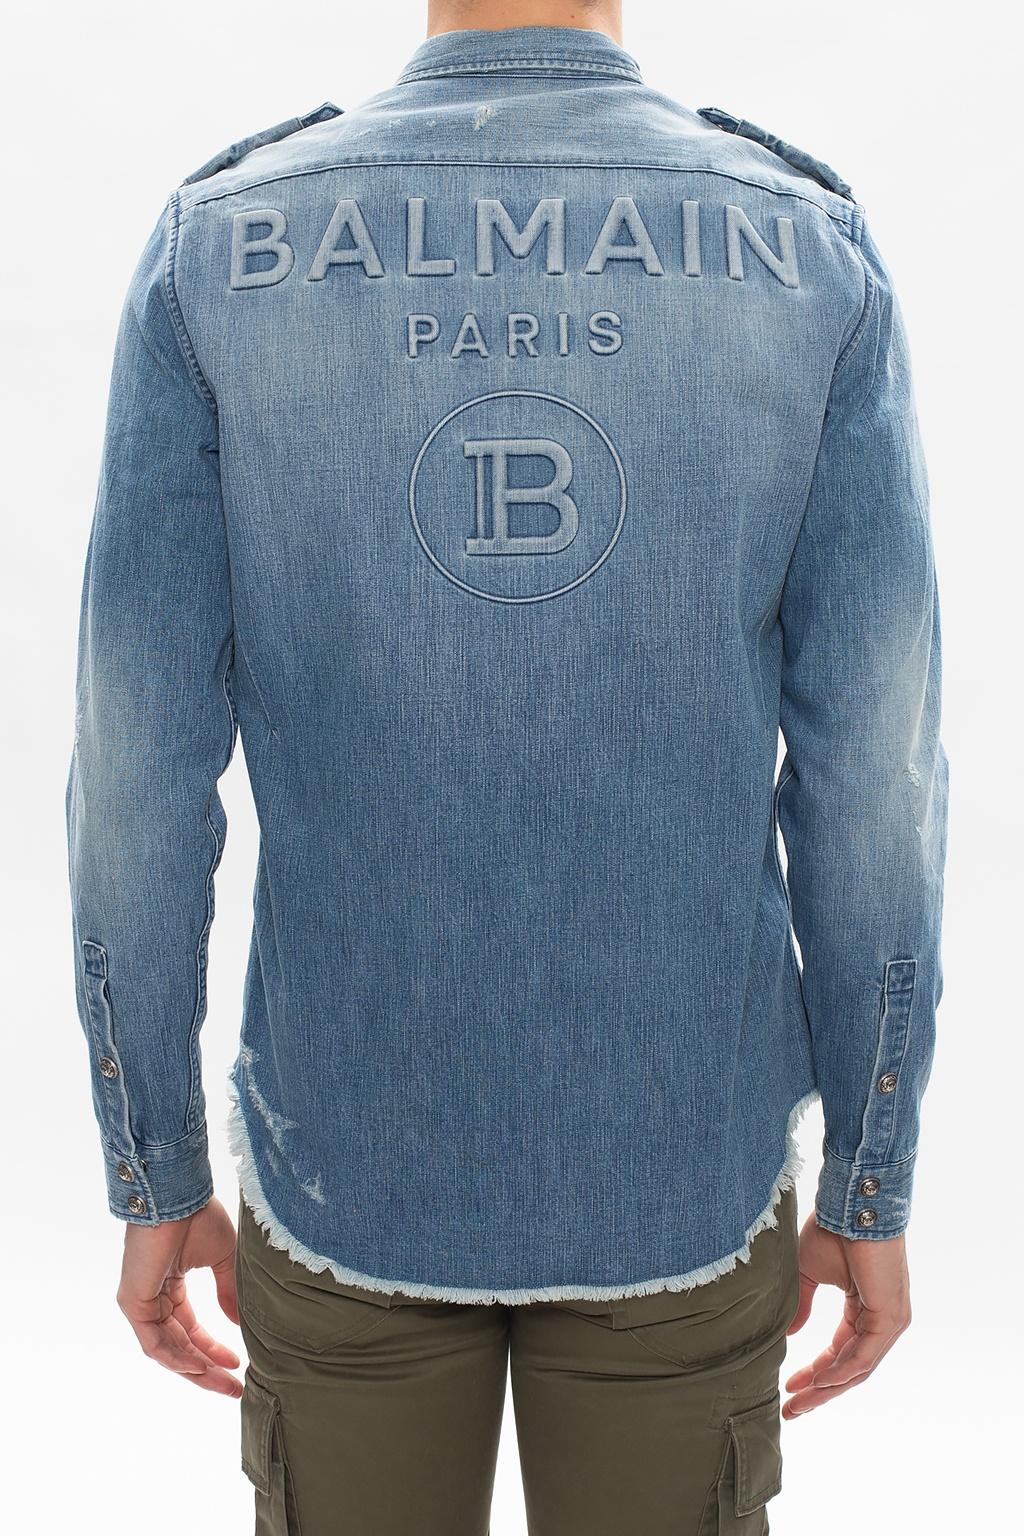 Balmain Time-worn denim shirt